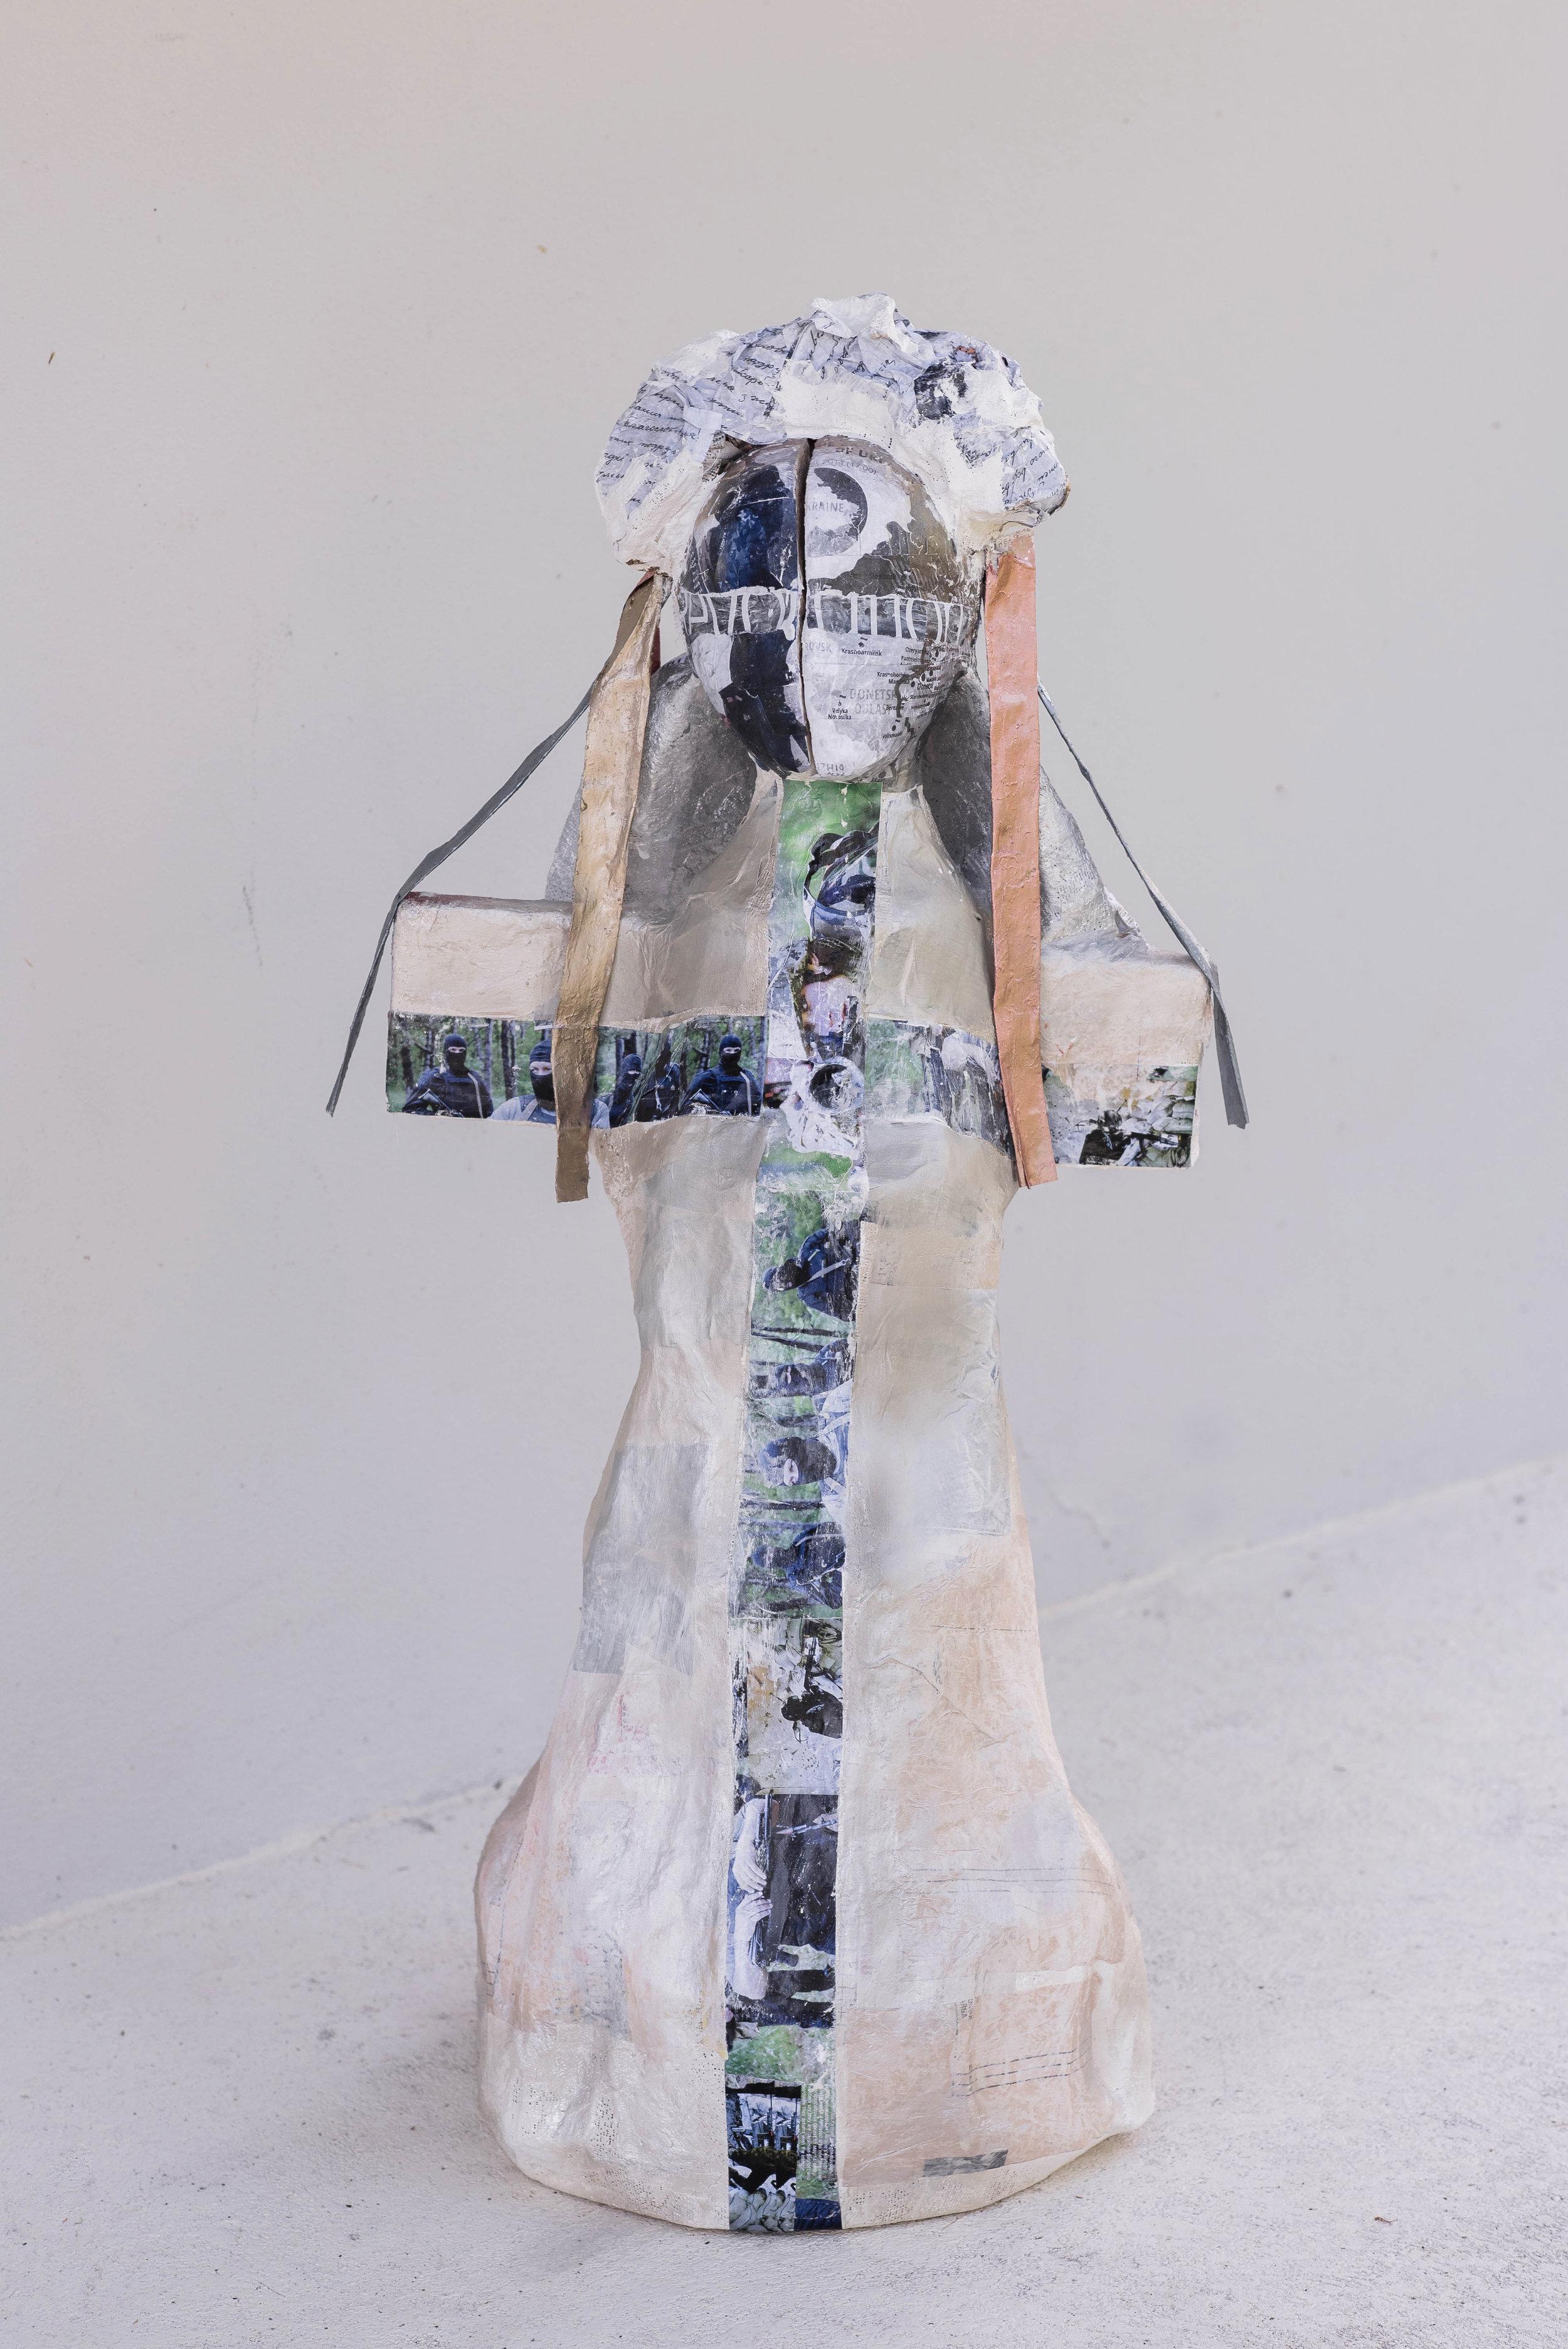 Sacrifice  1.0 x 0.5 meters, 2018 Paper mache, plaster of paris, styrofoam, cardboard, acrylic paint, paper, duct tape, wires, fabric, spray paint